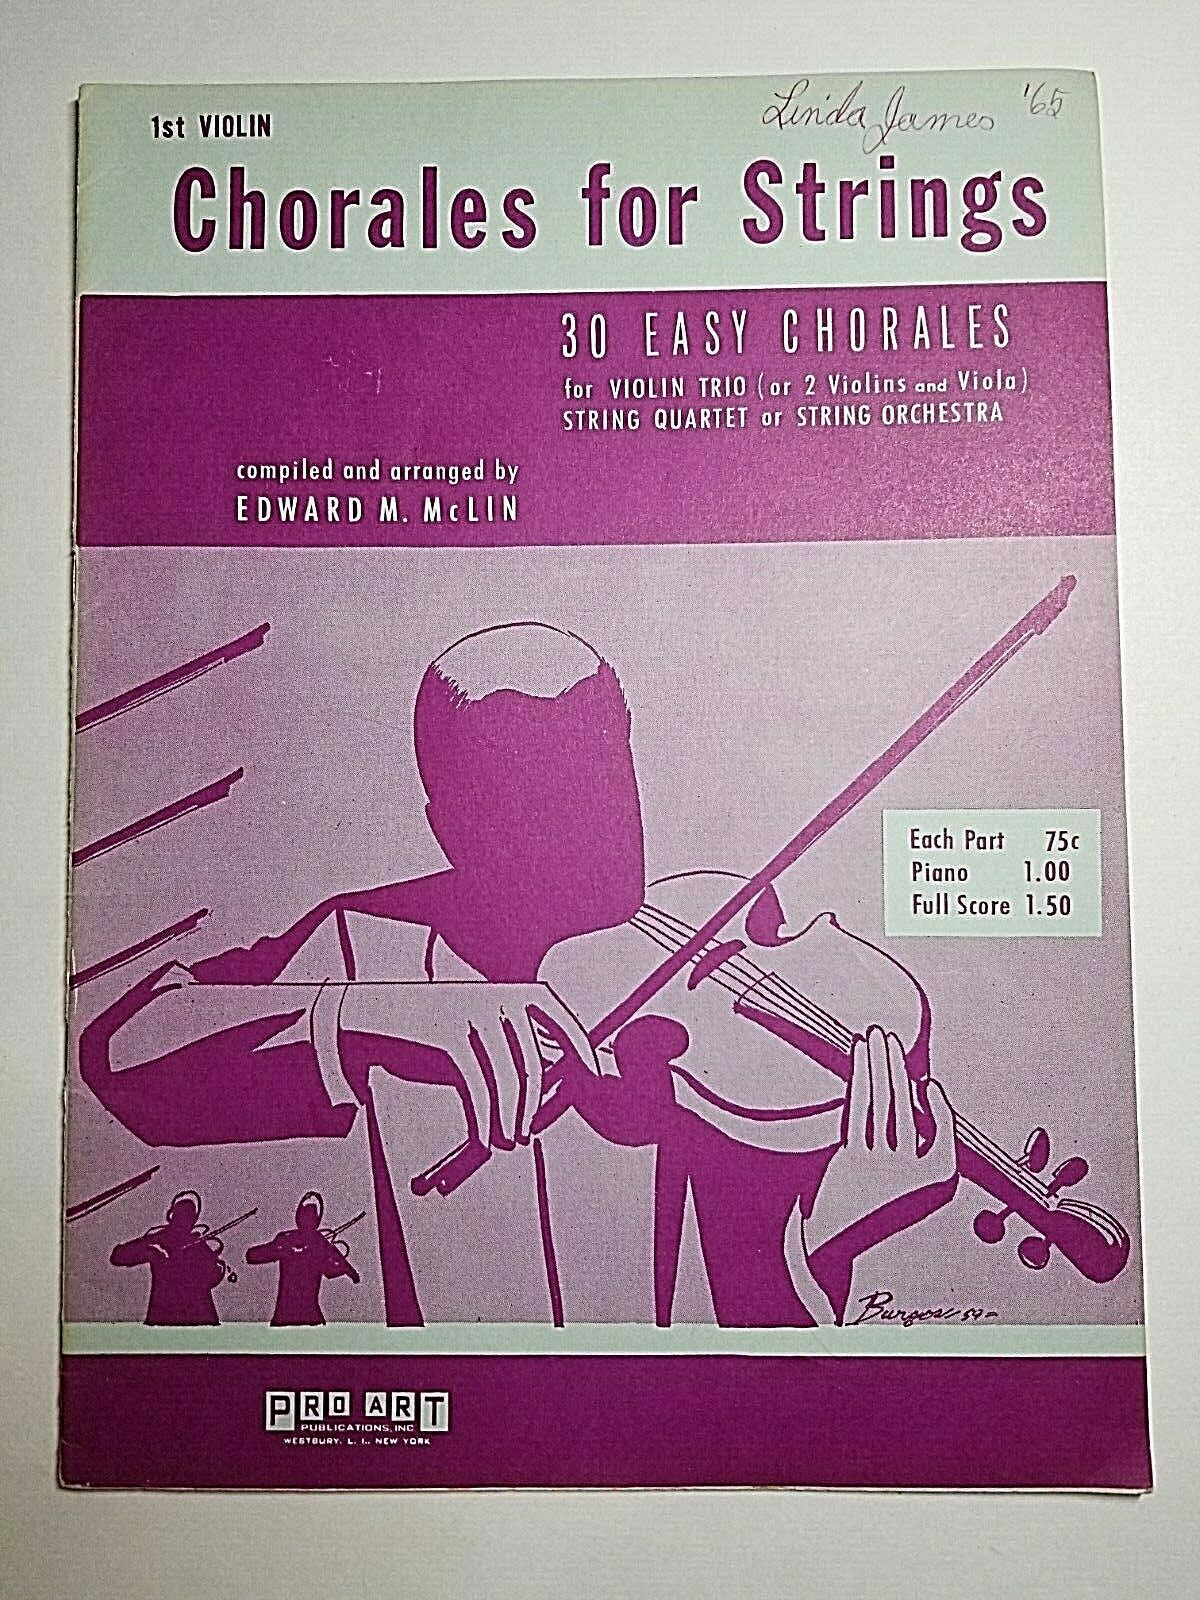 1st Violin Part Chorales For Strings 30 Easy Chorales Edward M McLin 1959 B4 - $11.75